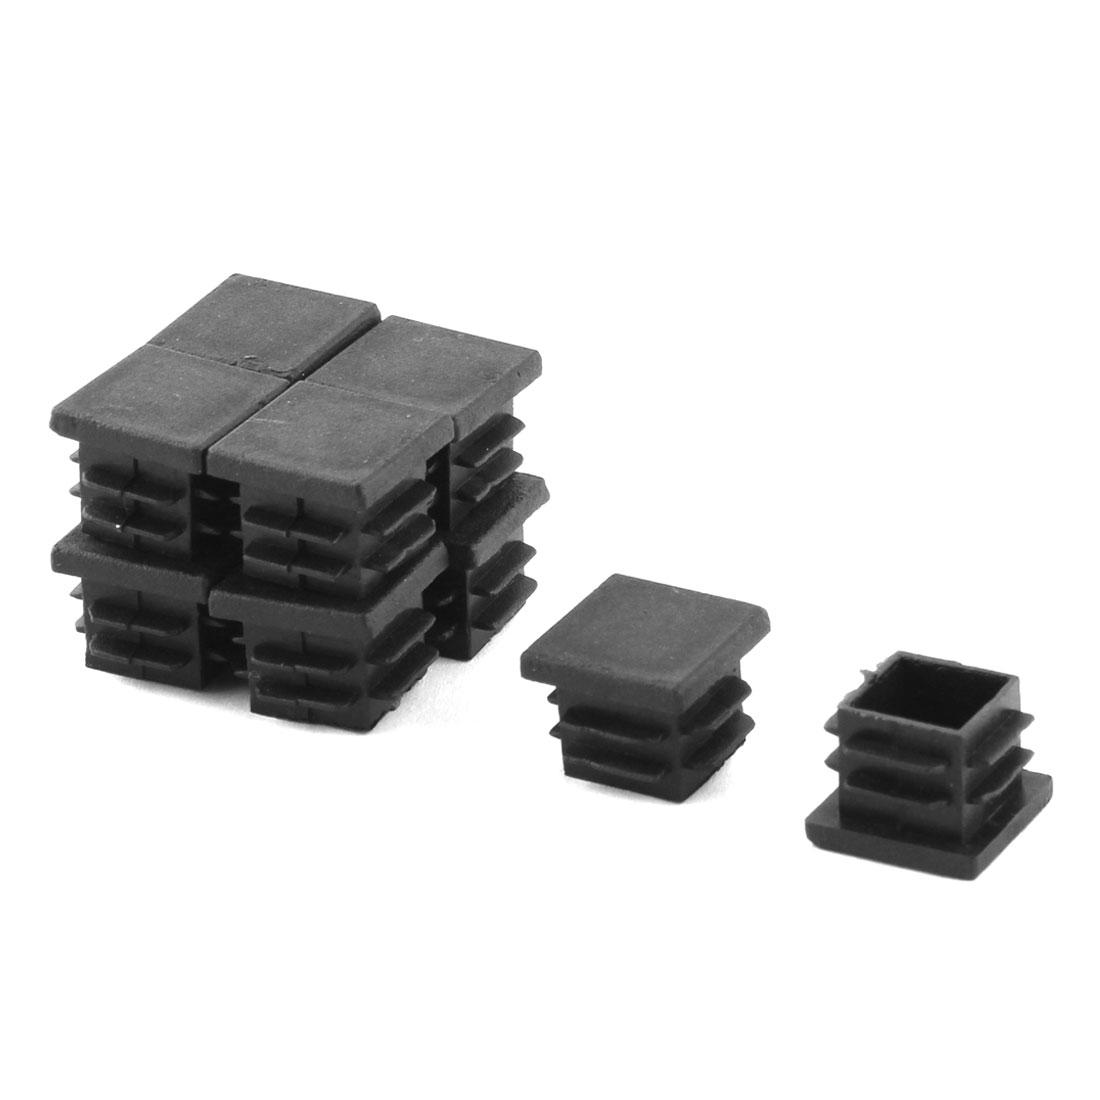 Plastic Square Design Tube Insert End Blanking Cover Cap Black 19 x 19mm 10pcs